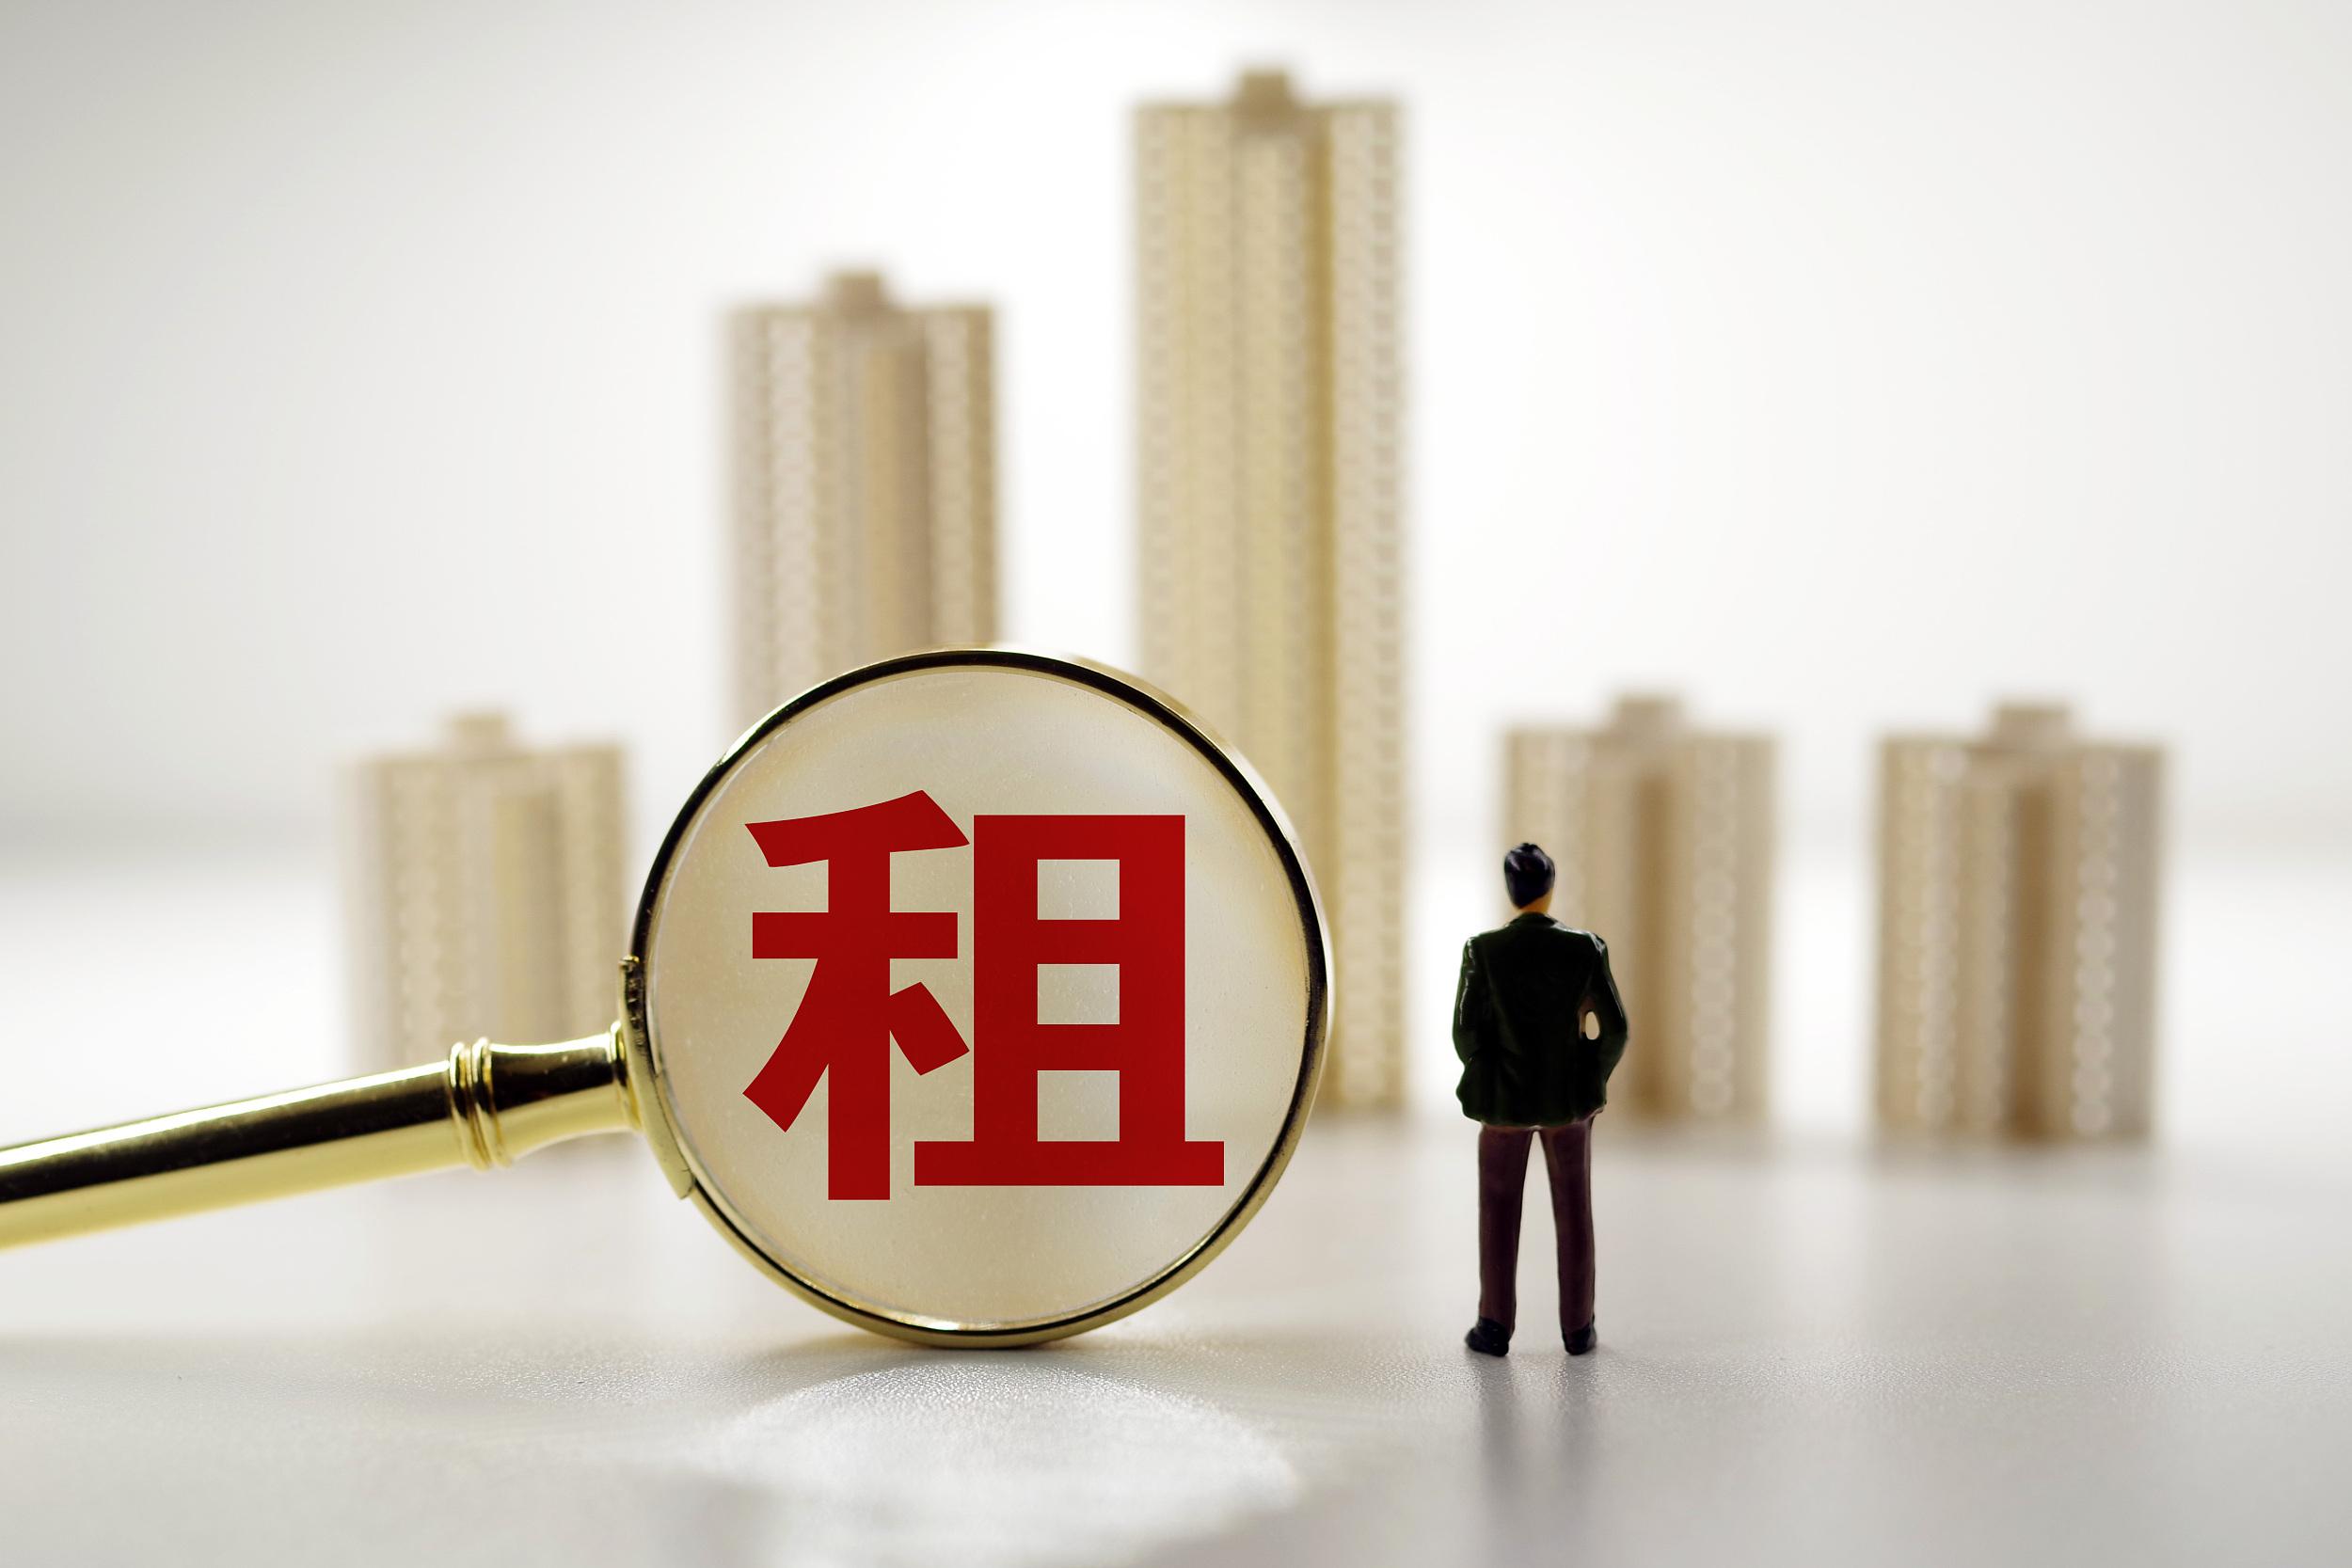 青年租房(fang)權益保護亟待加強(qiang)